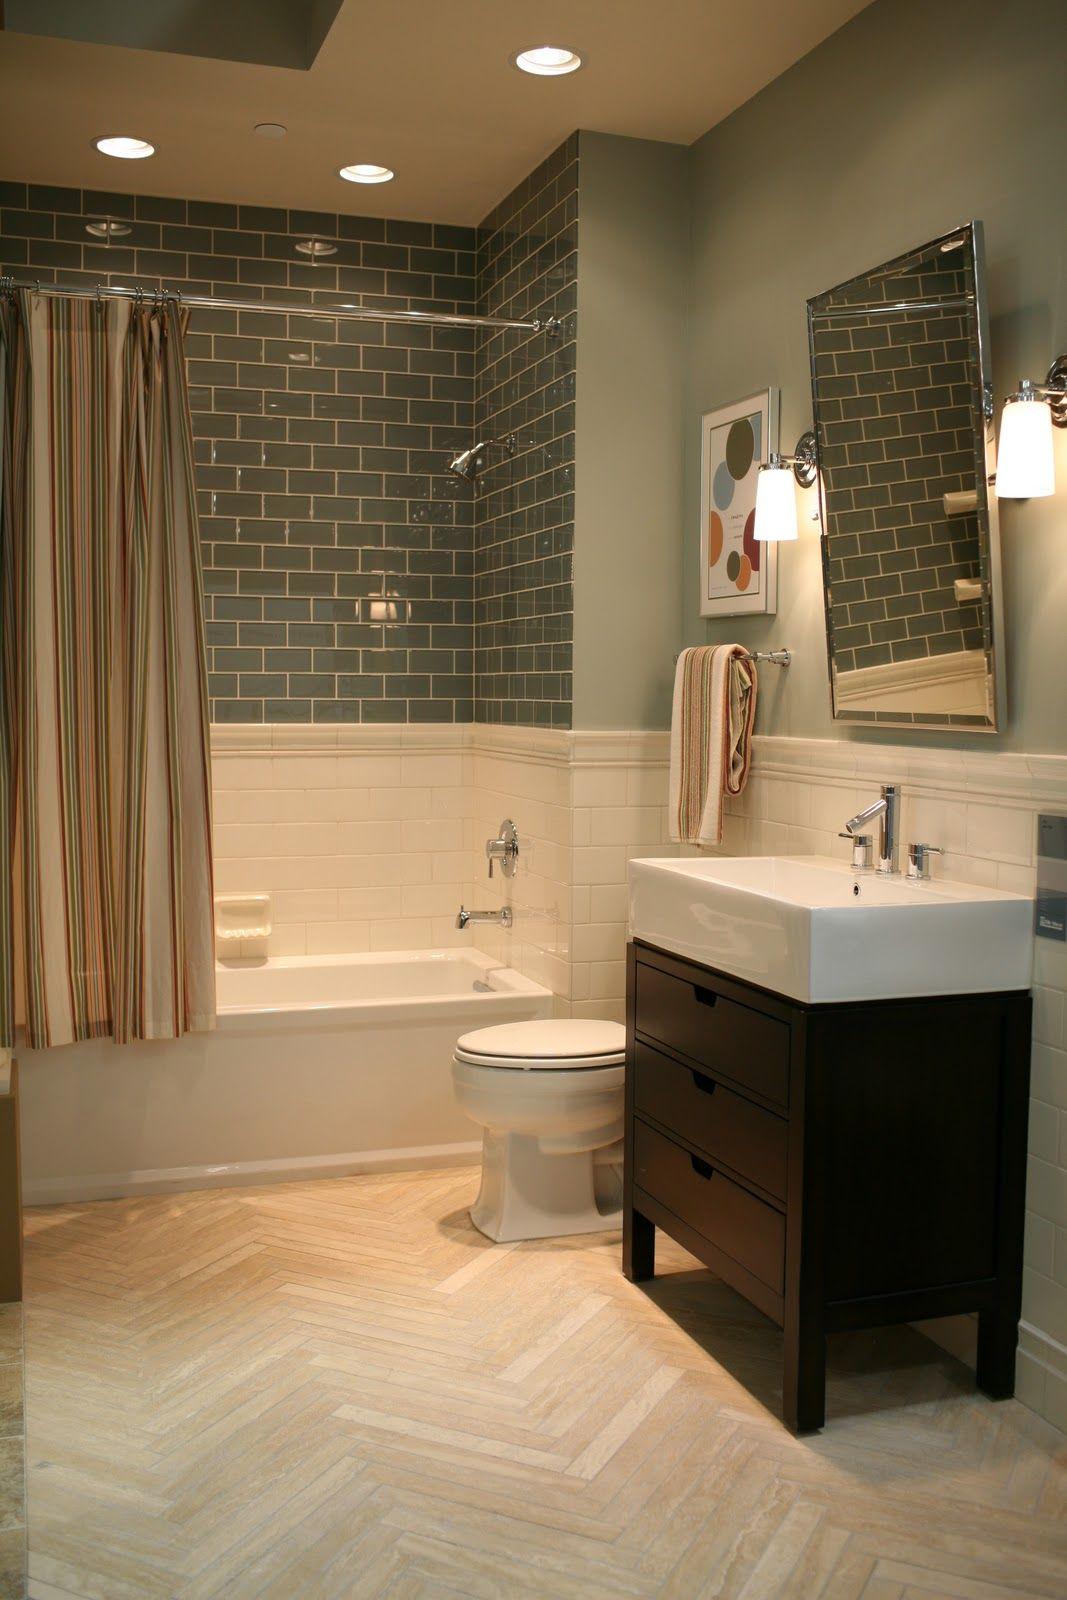 The tile shop design by kirsty georgian bathroom style - Bathrooms Stone Tile Bathroom Options From Westside Tile Stone